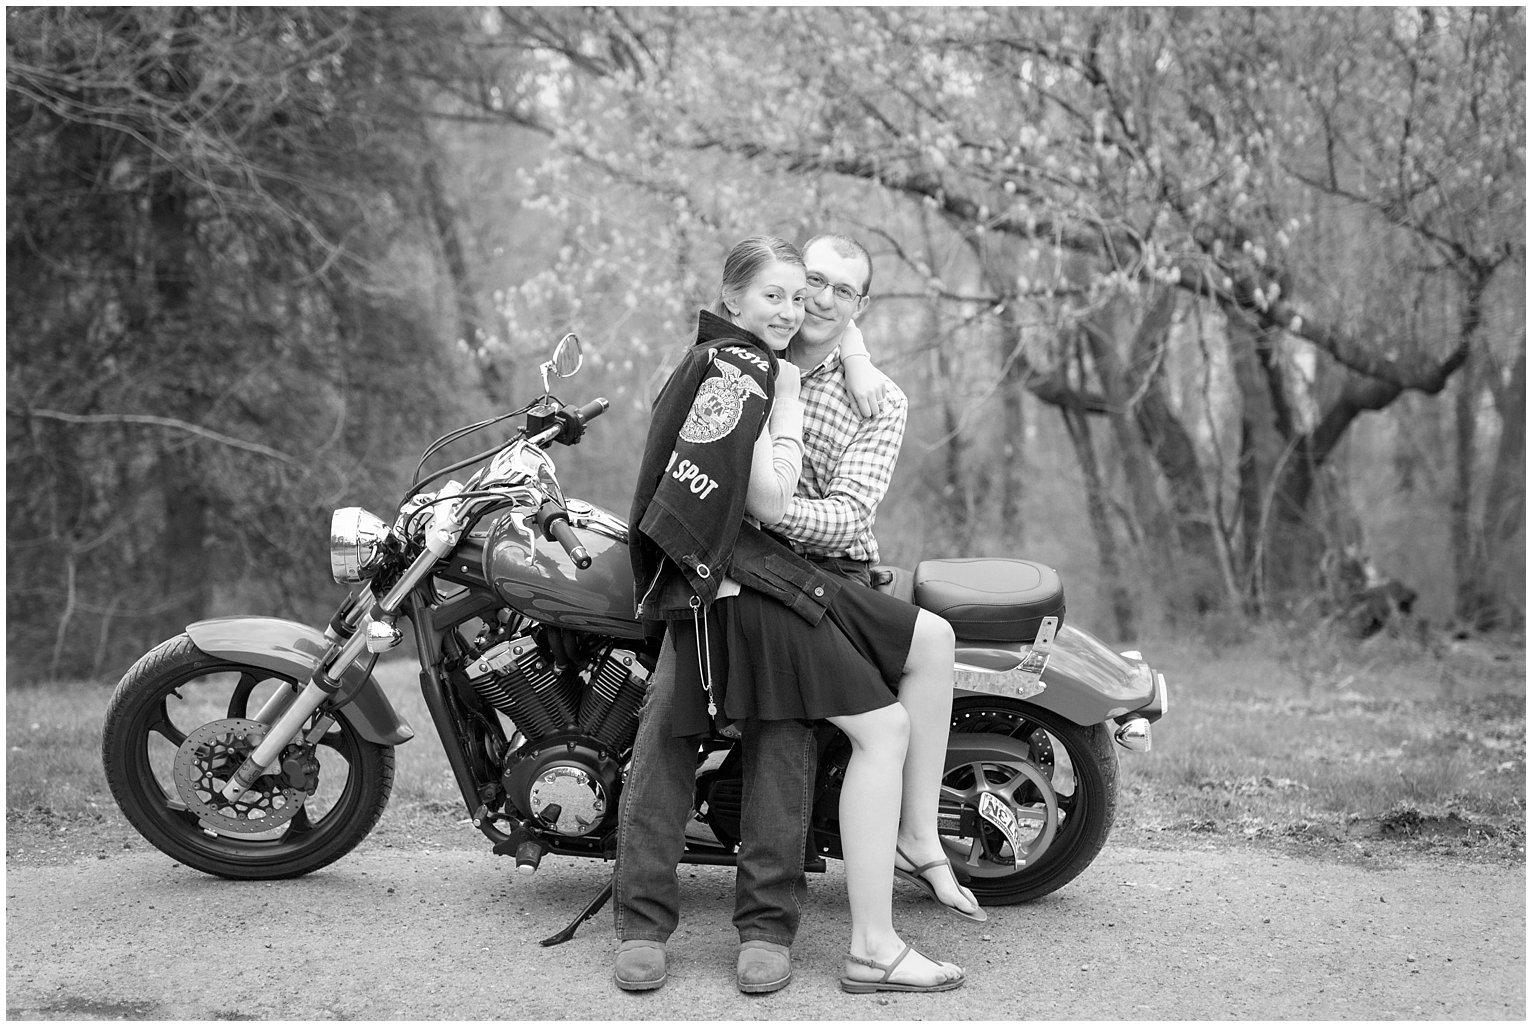 motorcycle-engagement-motorcycle-photo